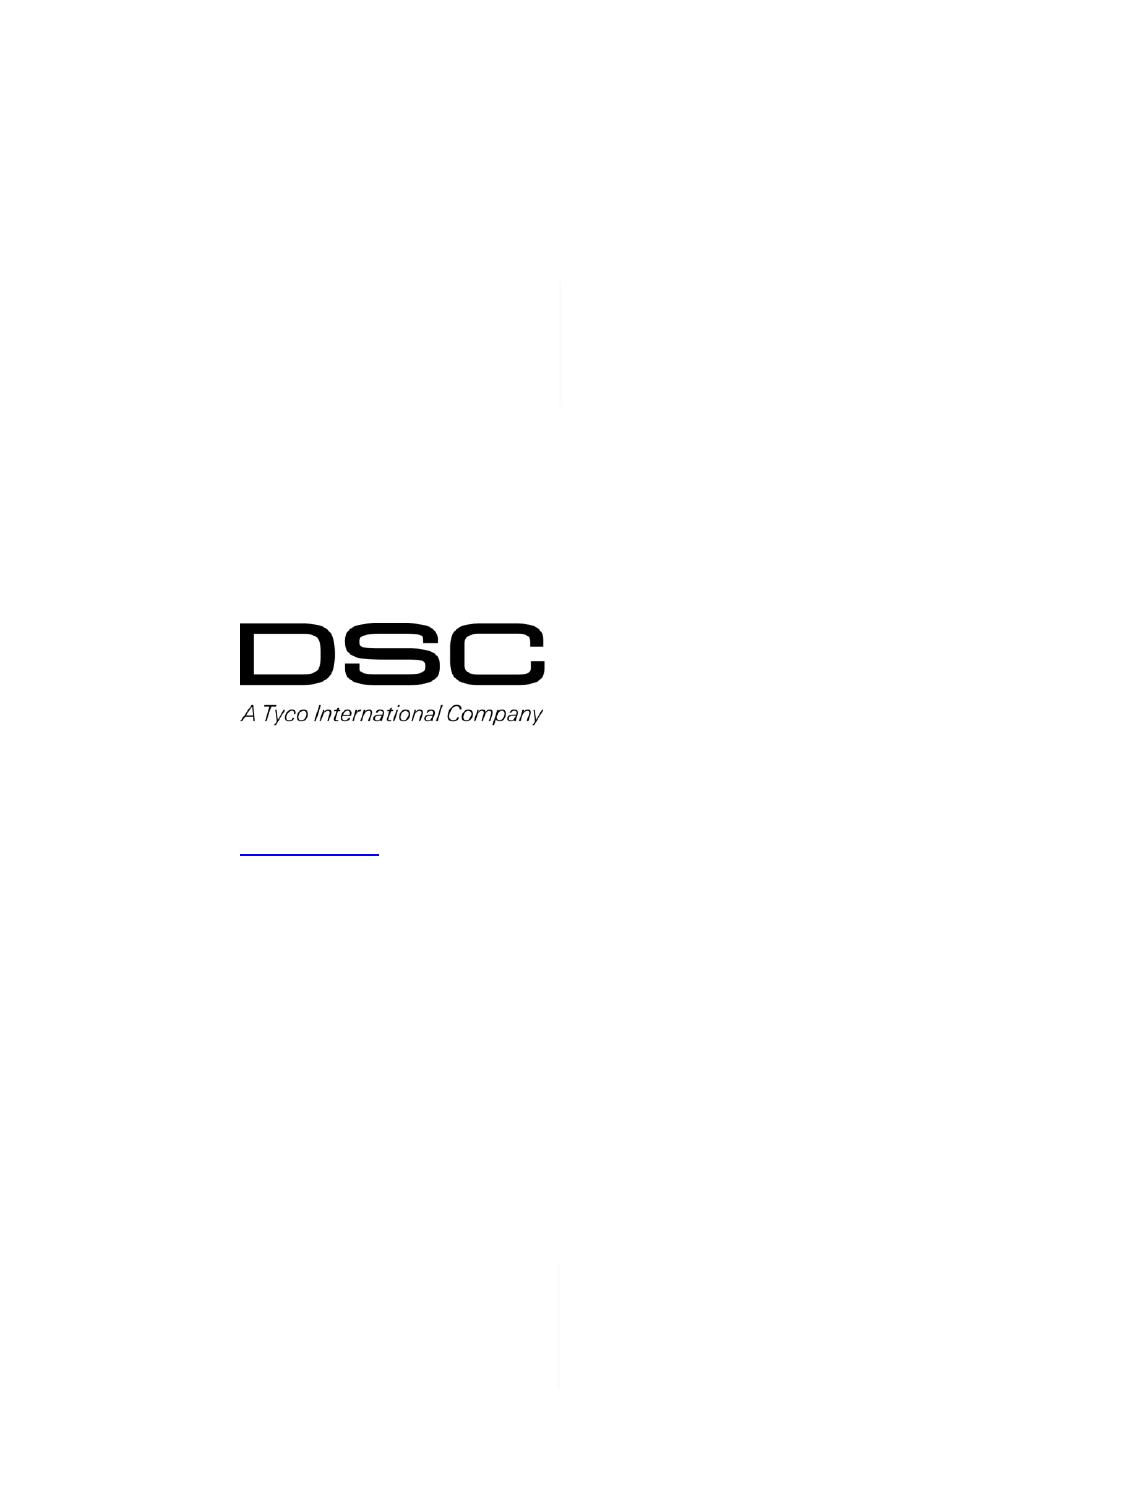 Dsc Powerseries Neo Hs2016 Hs2032 Hs2064 Hs2128 Host Architecture Wiring Diagram 3301 Langstaff Road Concord Ontario